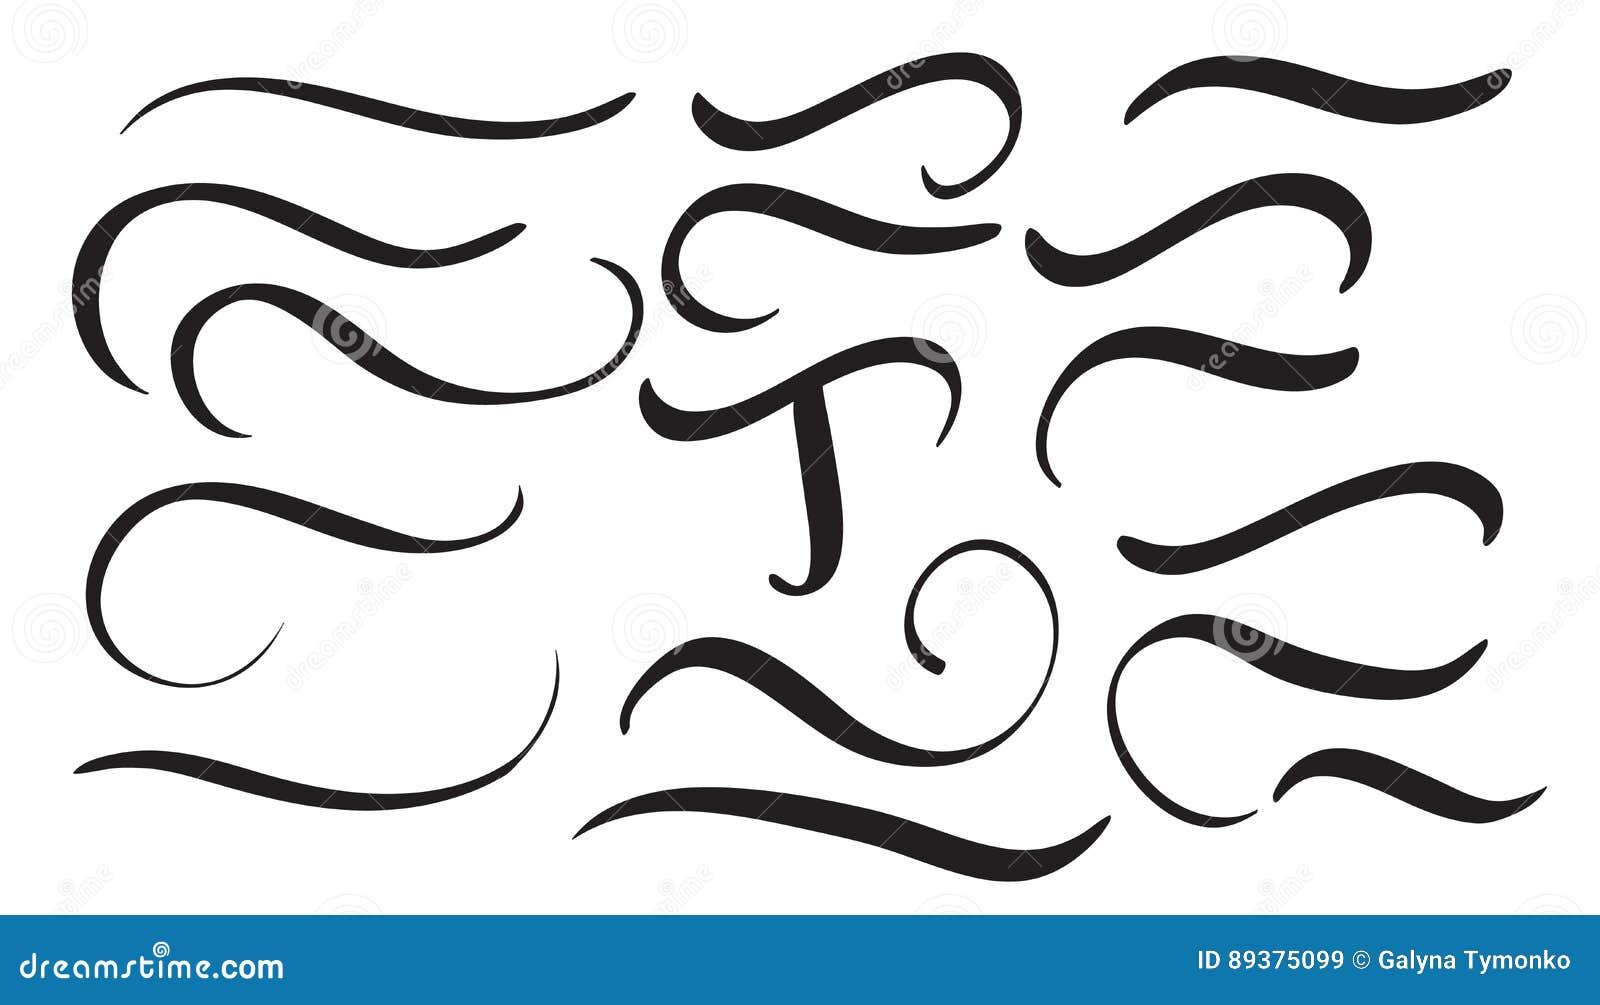 Set Of Vintage Flourish Decorative Art Calligraphy Whorls